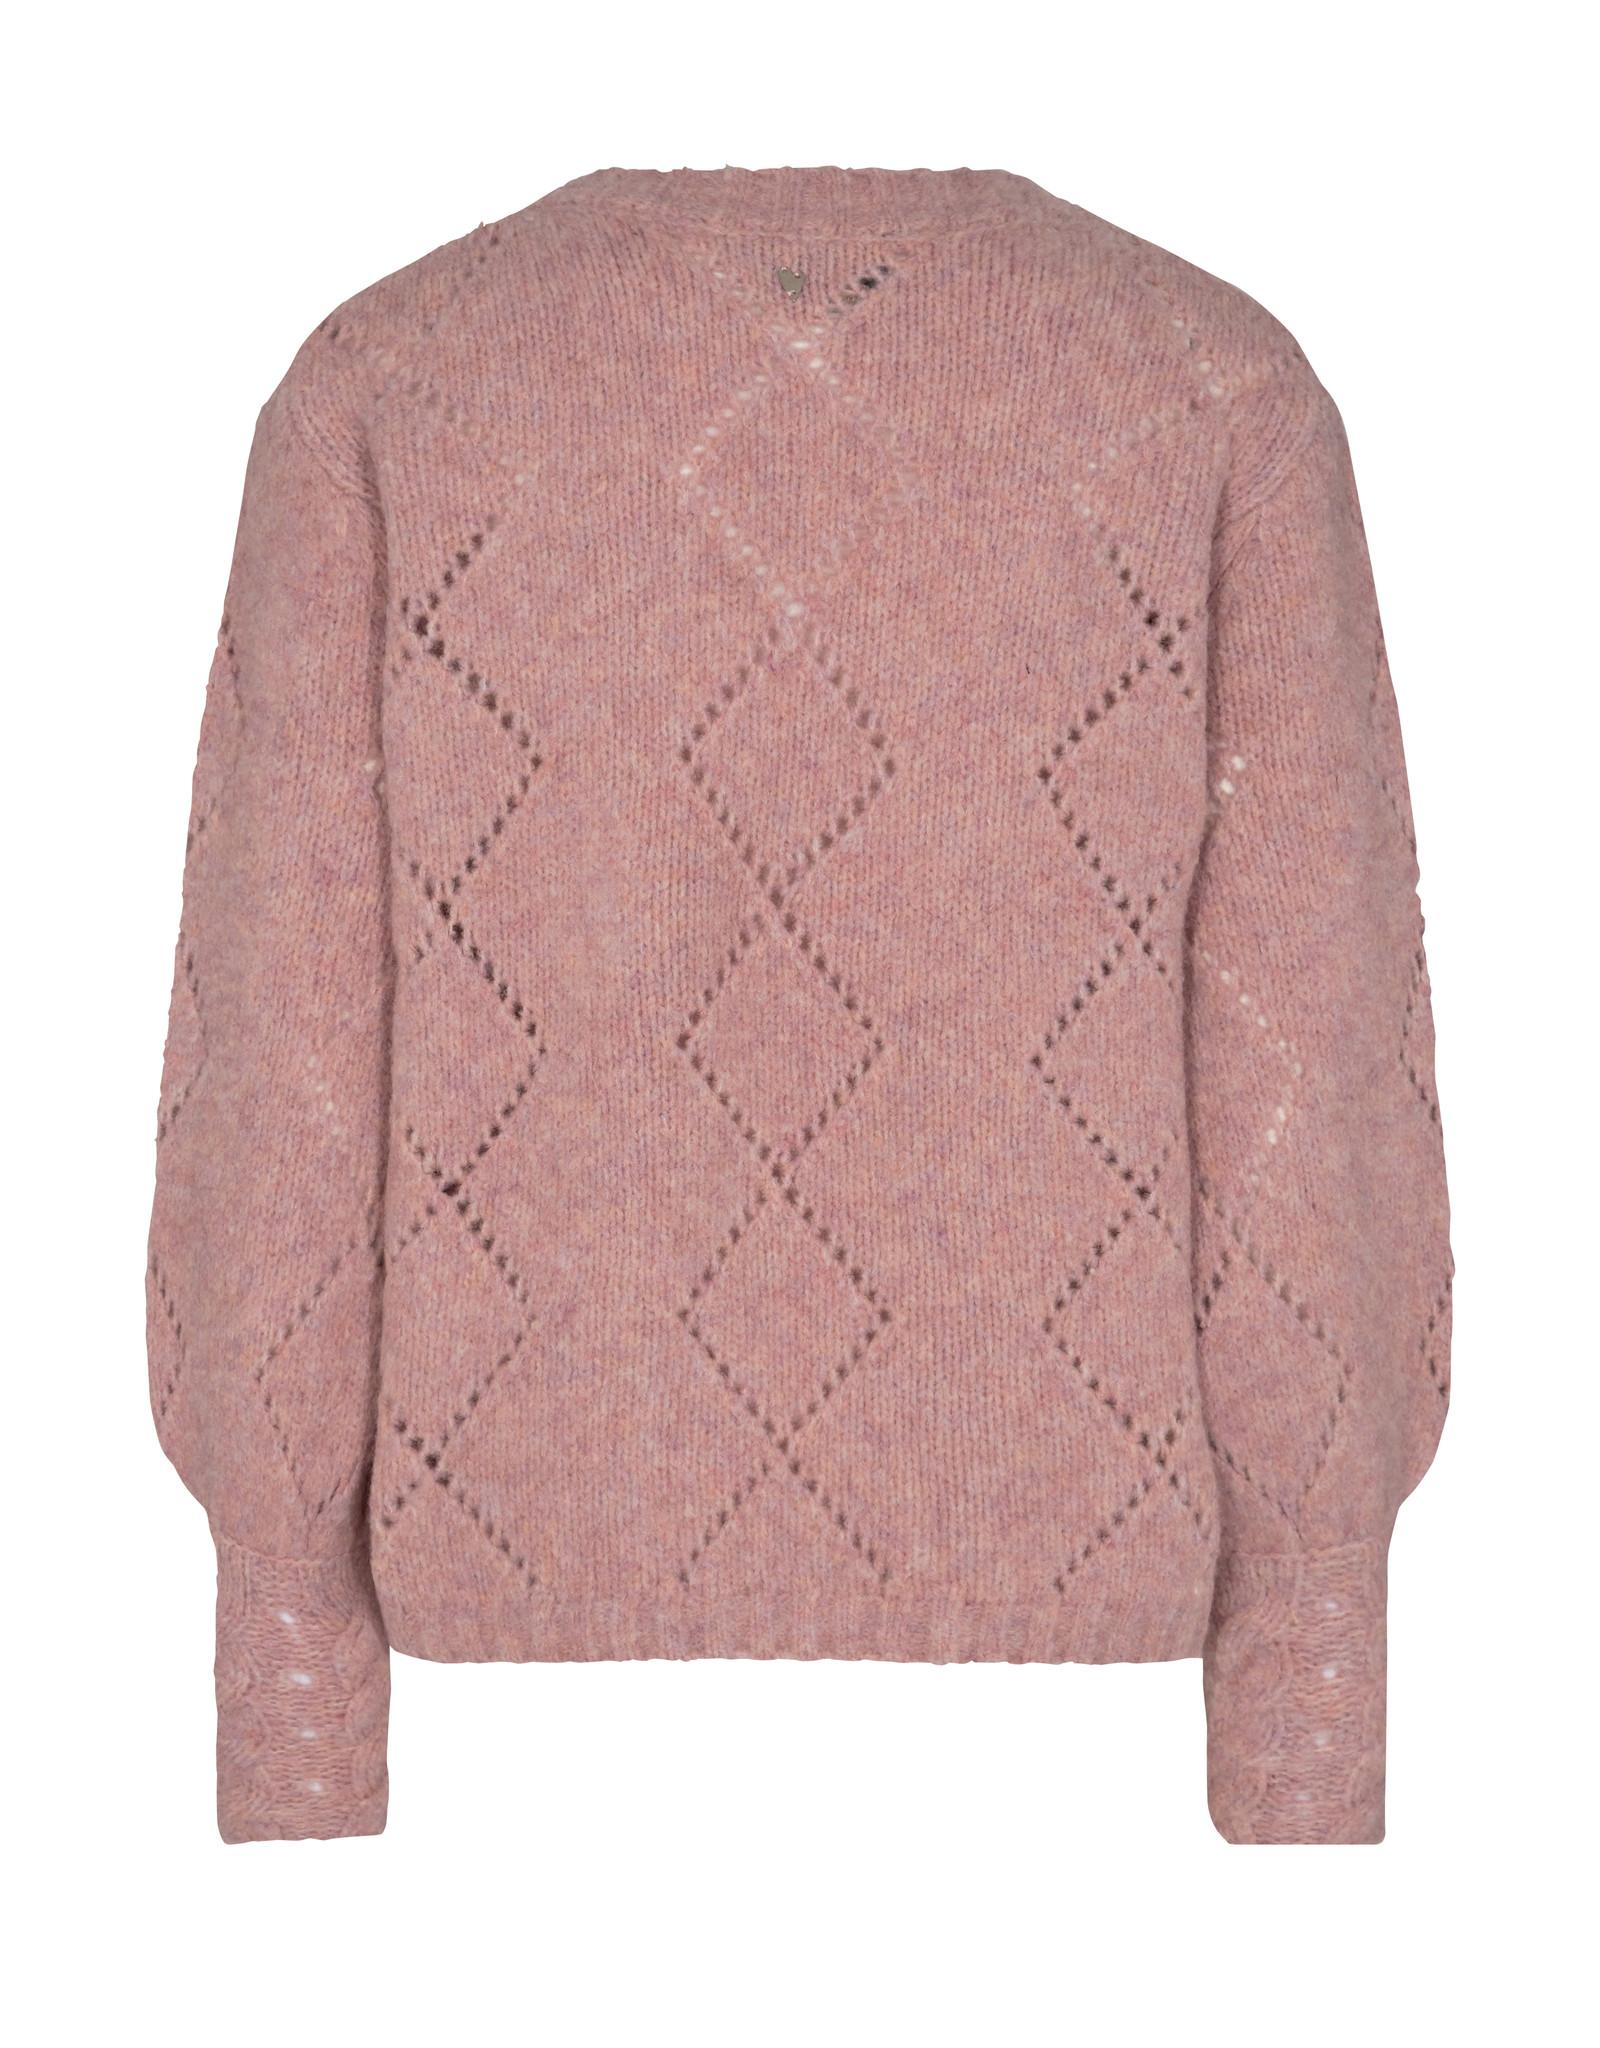 Mos Mosh Mos Mosh Zimma Sweater